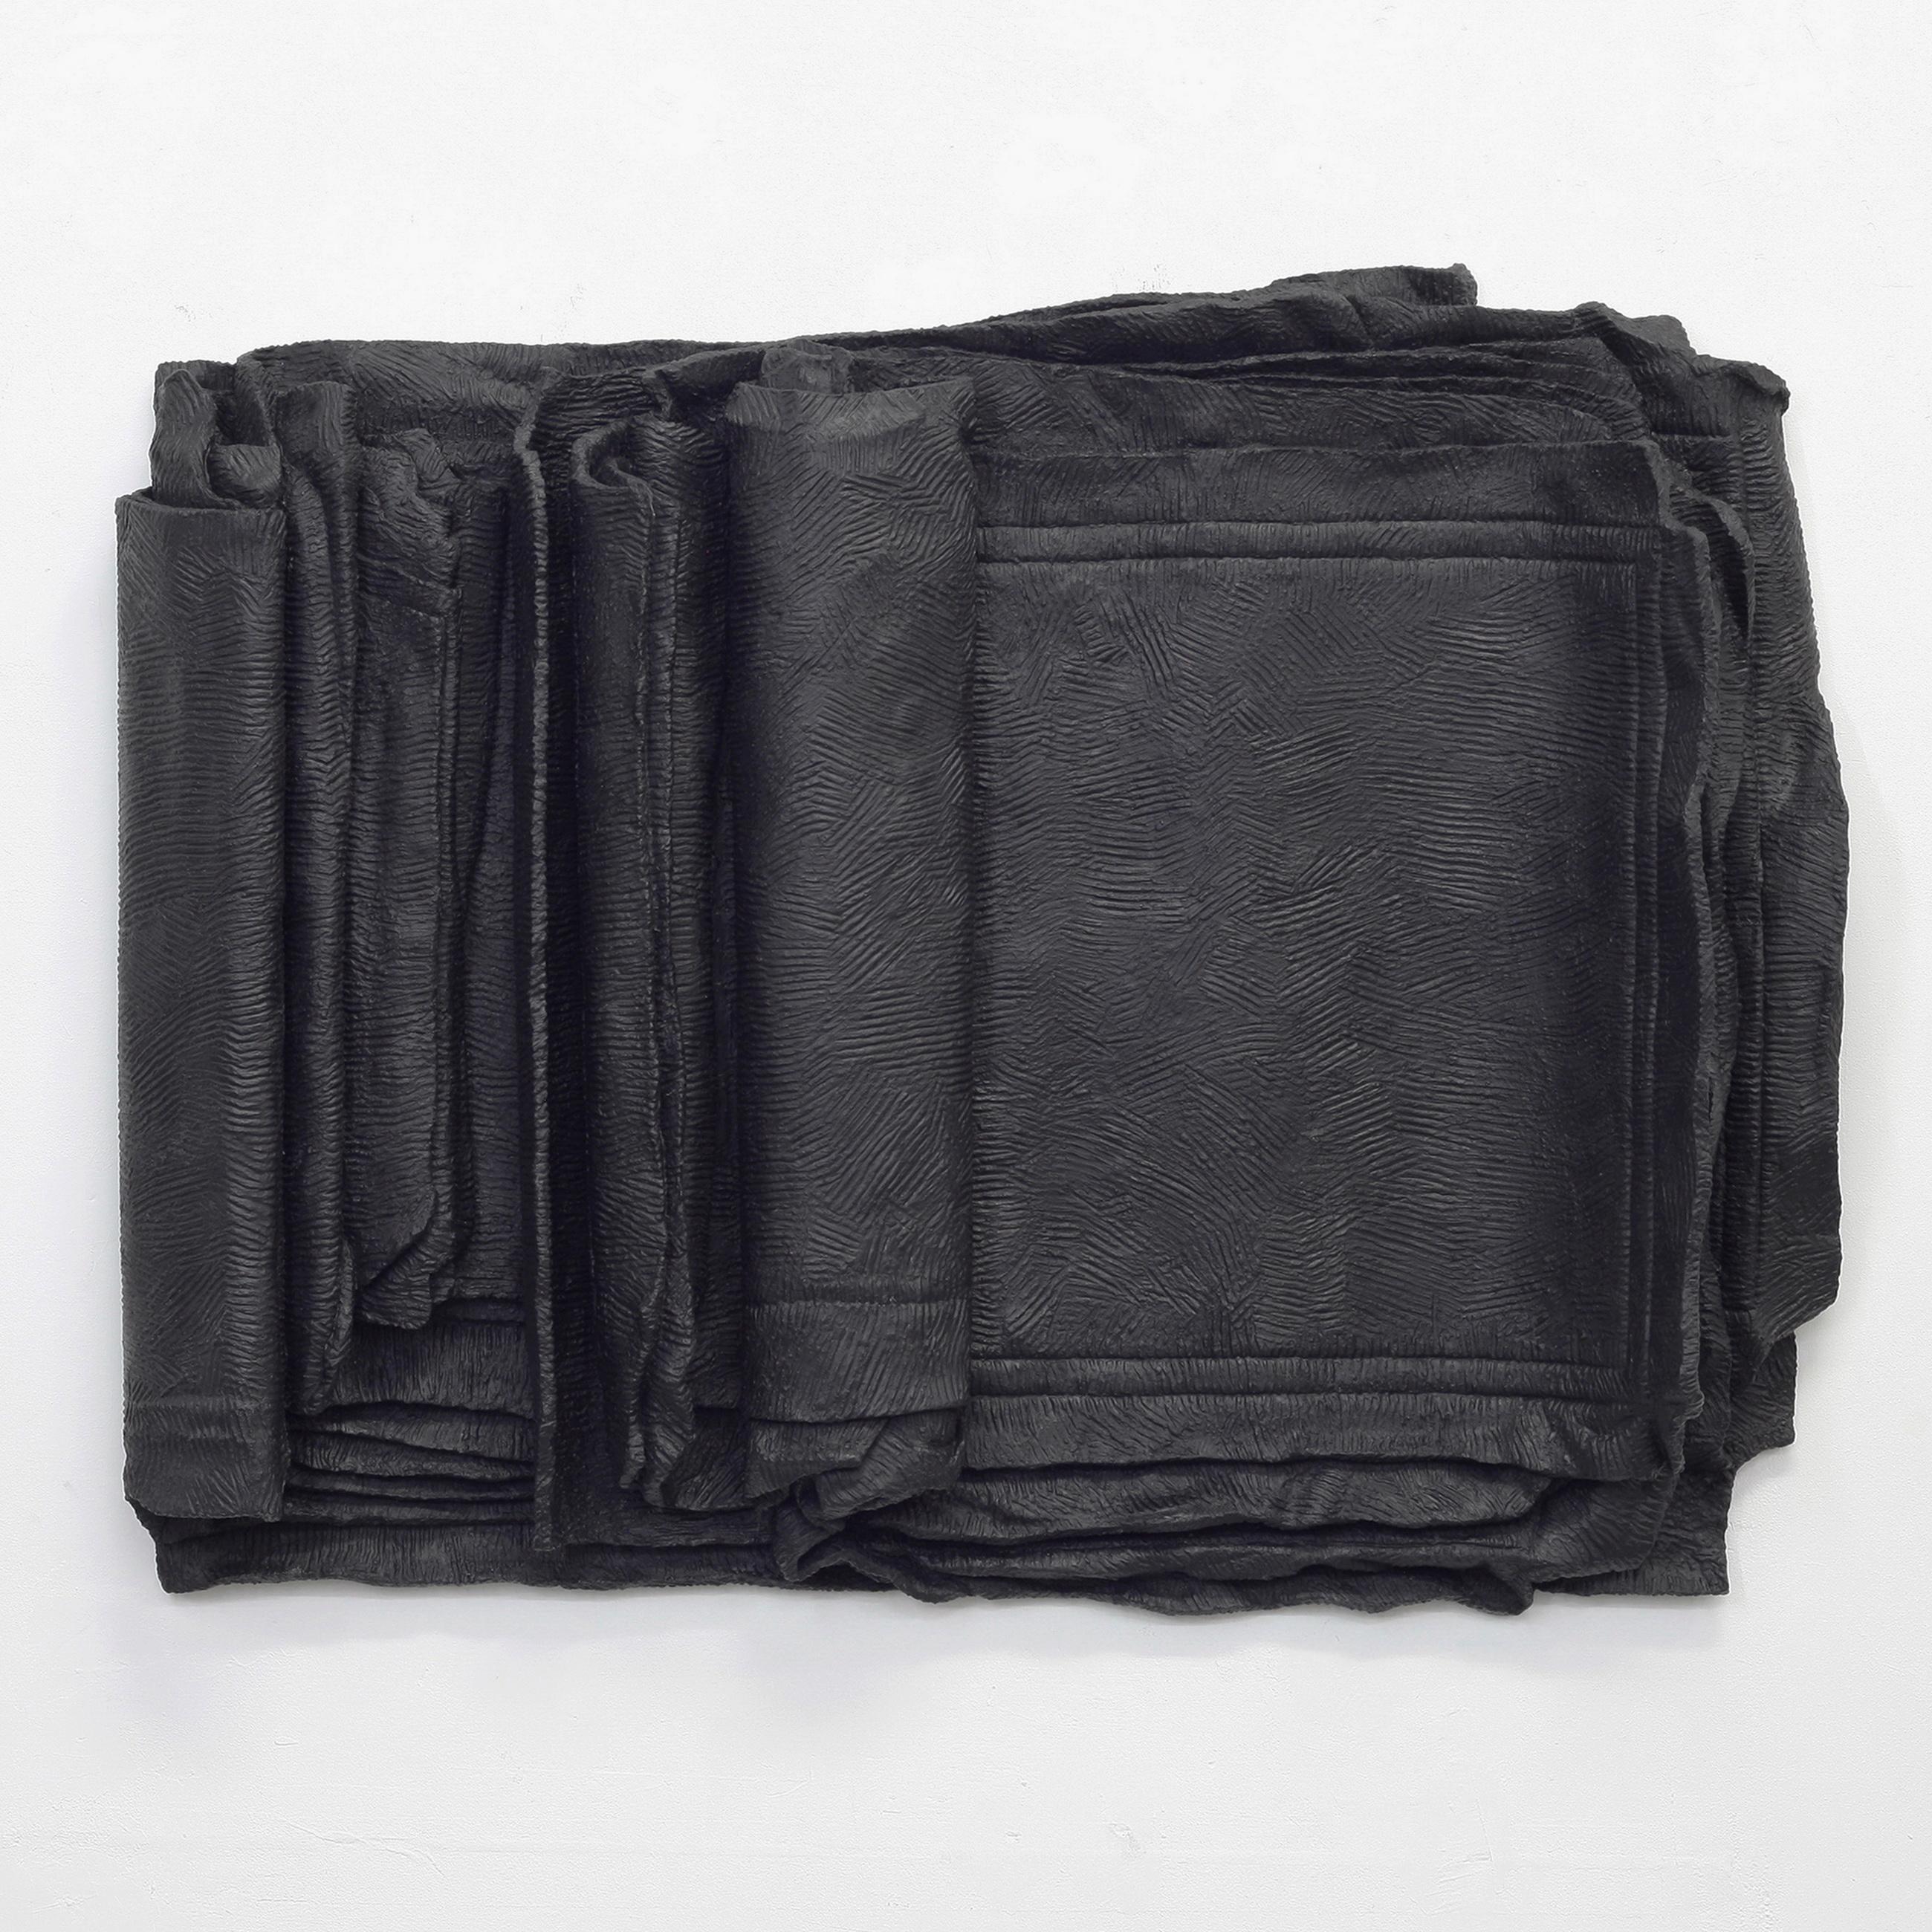 Besser Vertikal 03 is a black sculpture by Erik Andersen. Material: Epoxy Resin